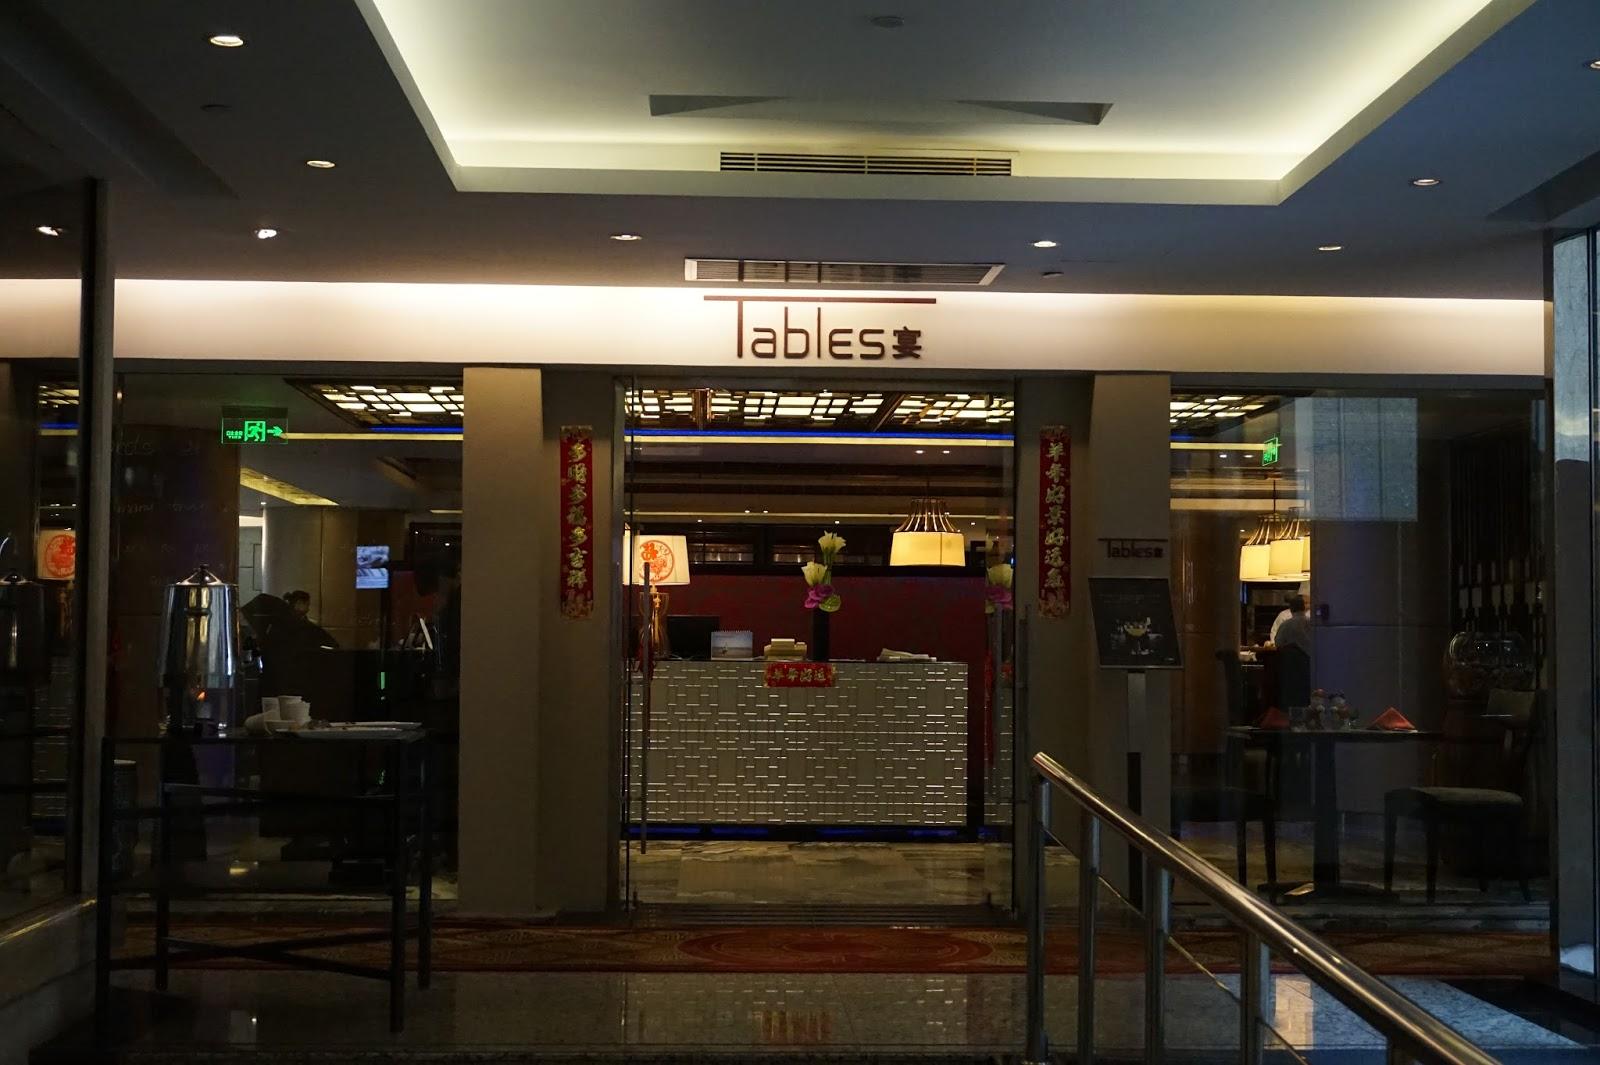 portman ritz-carlton shanghai china prc hotel review tables restaurant